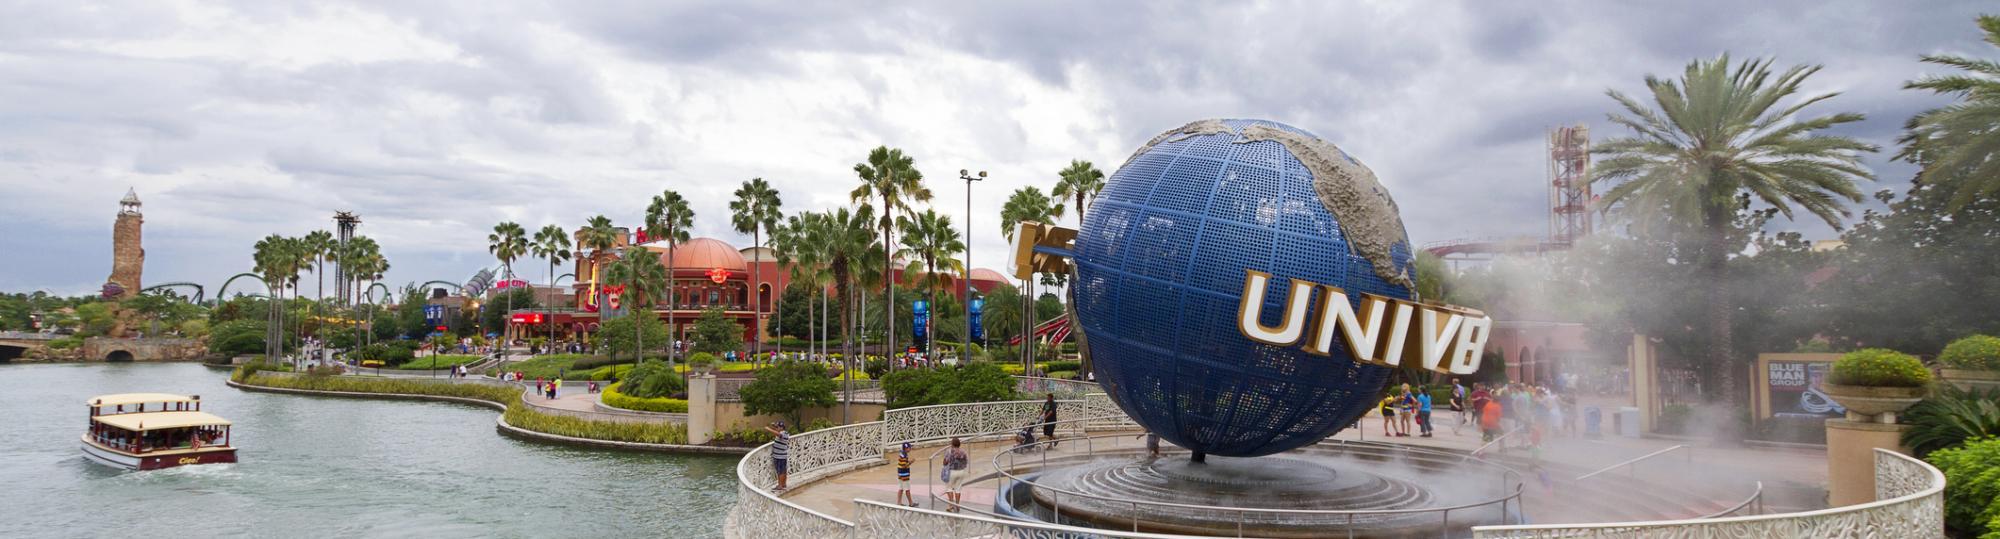 Universal Orlando Military Discount with Veterans Advantage